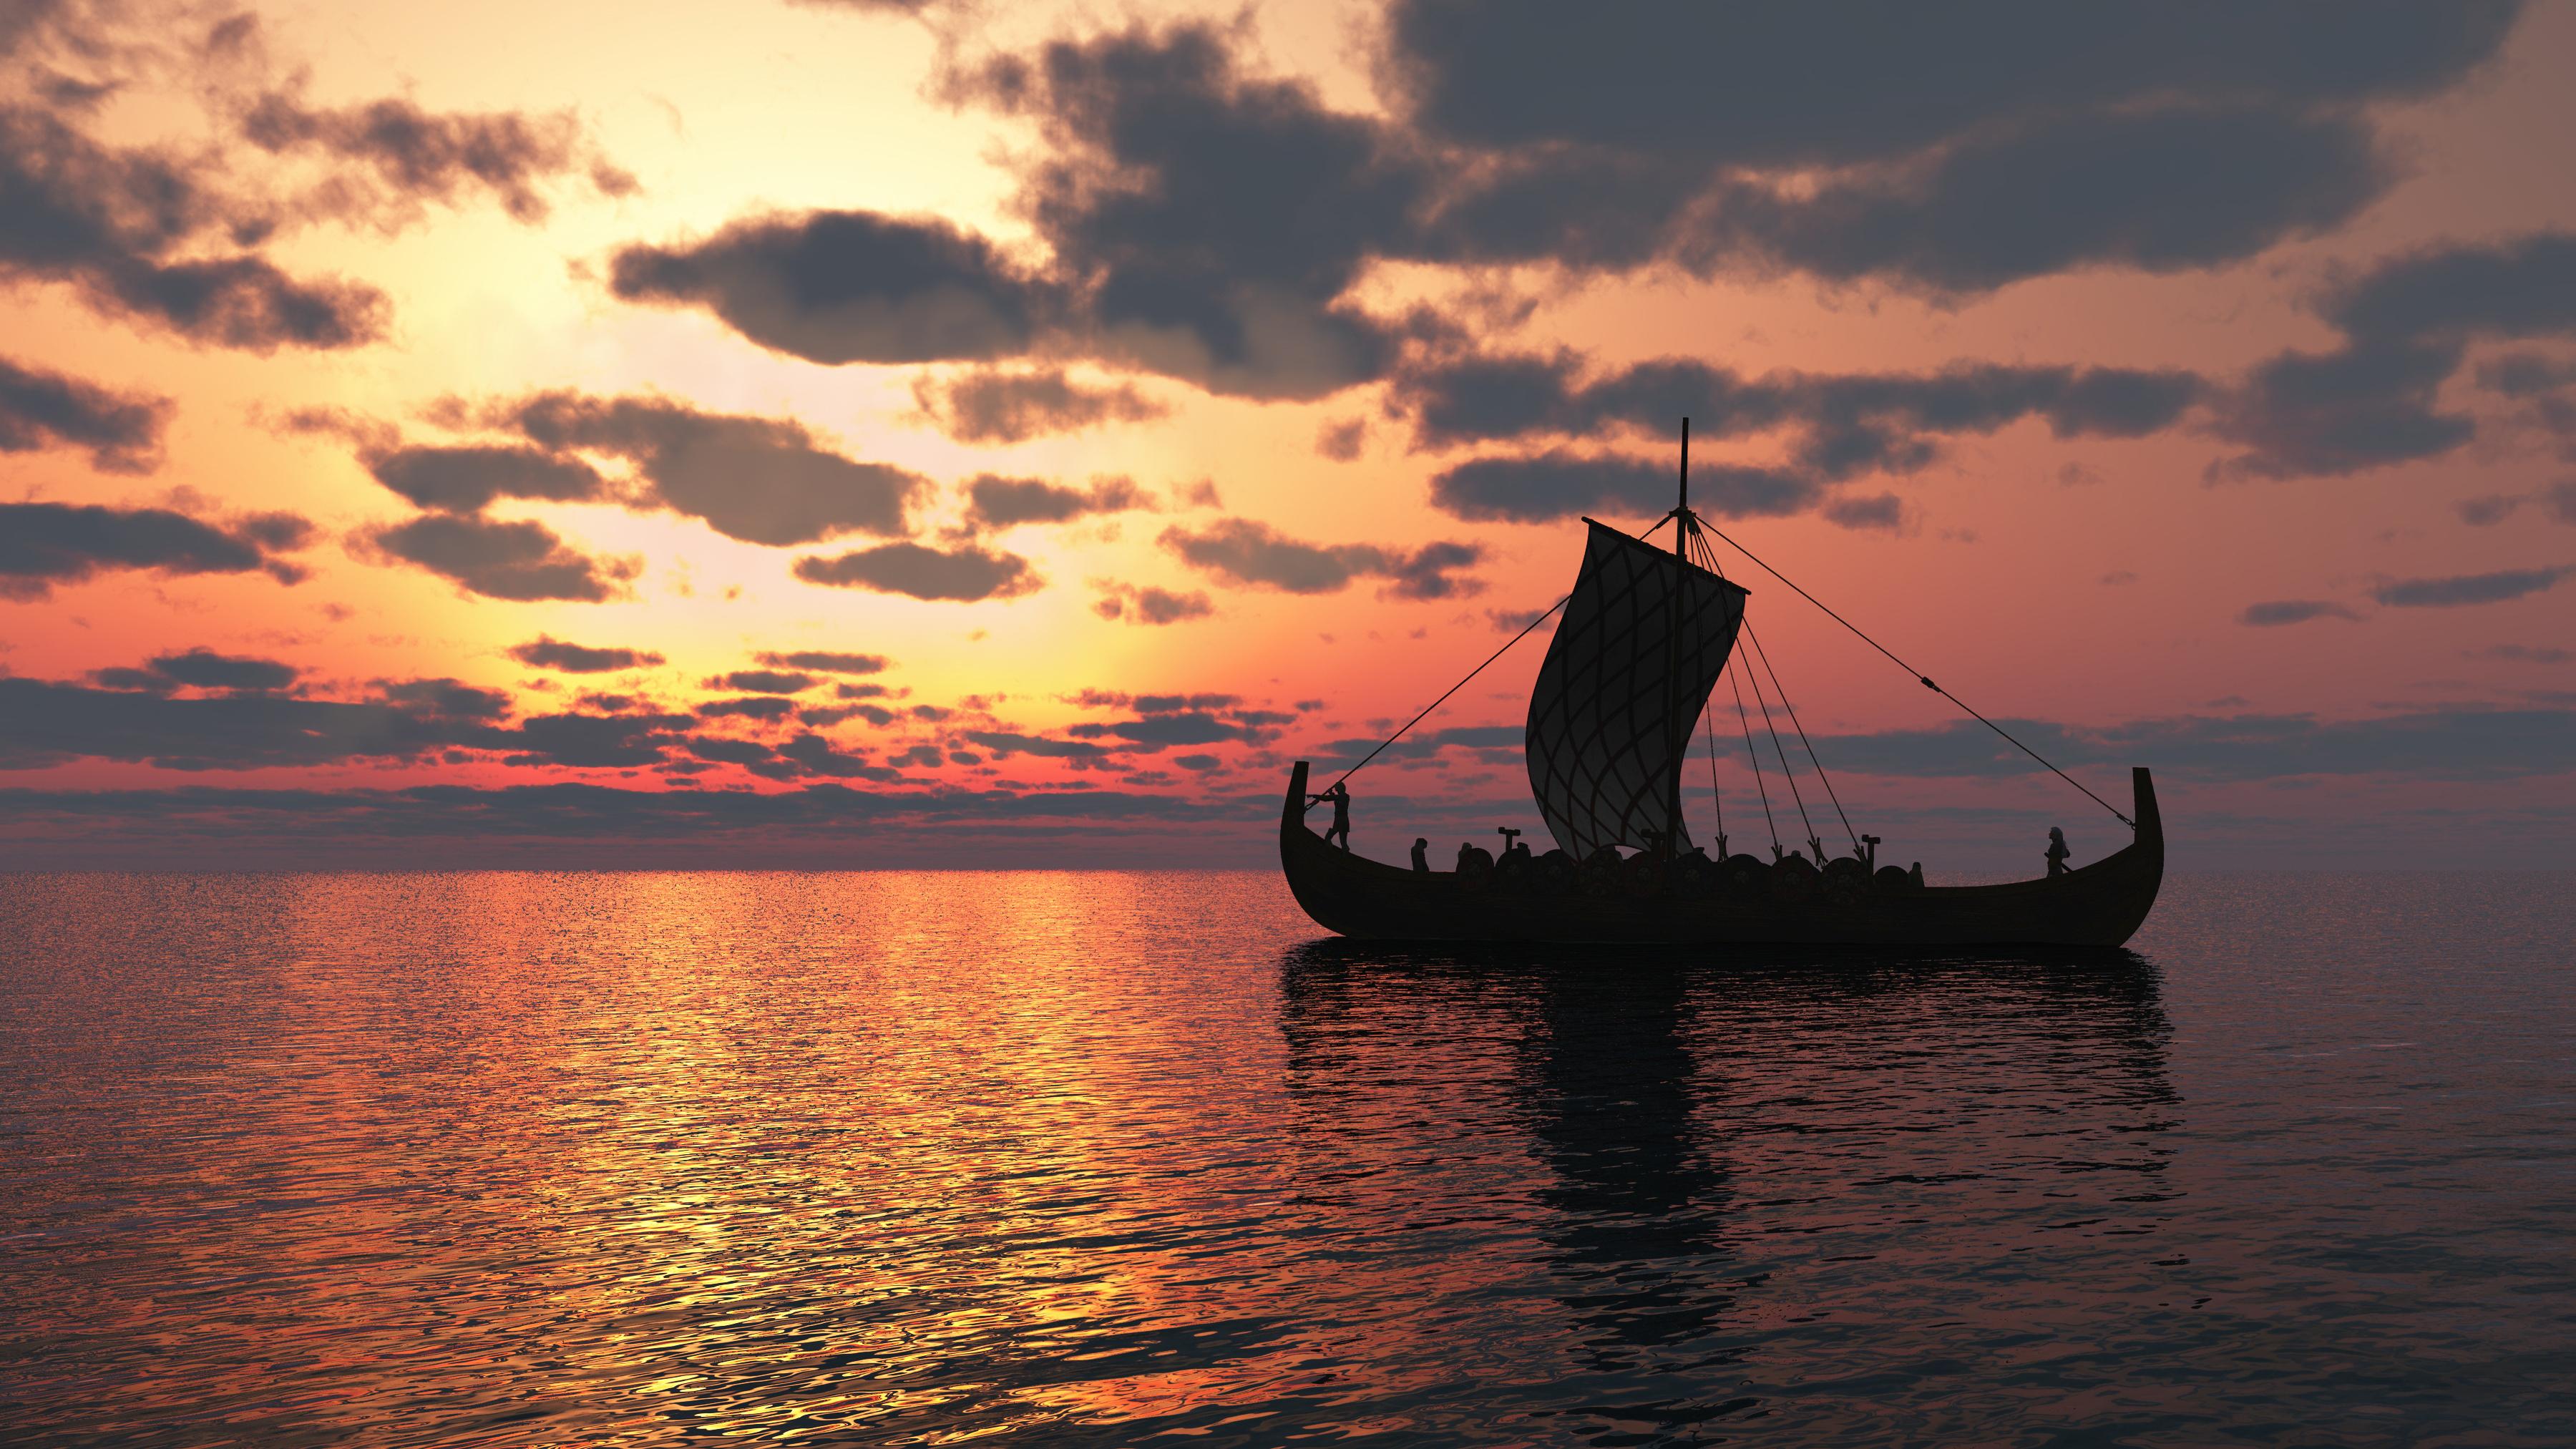 Viking longship sailing on a calm sea at sunset.